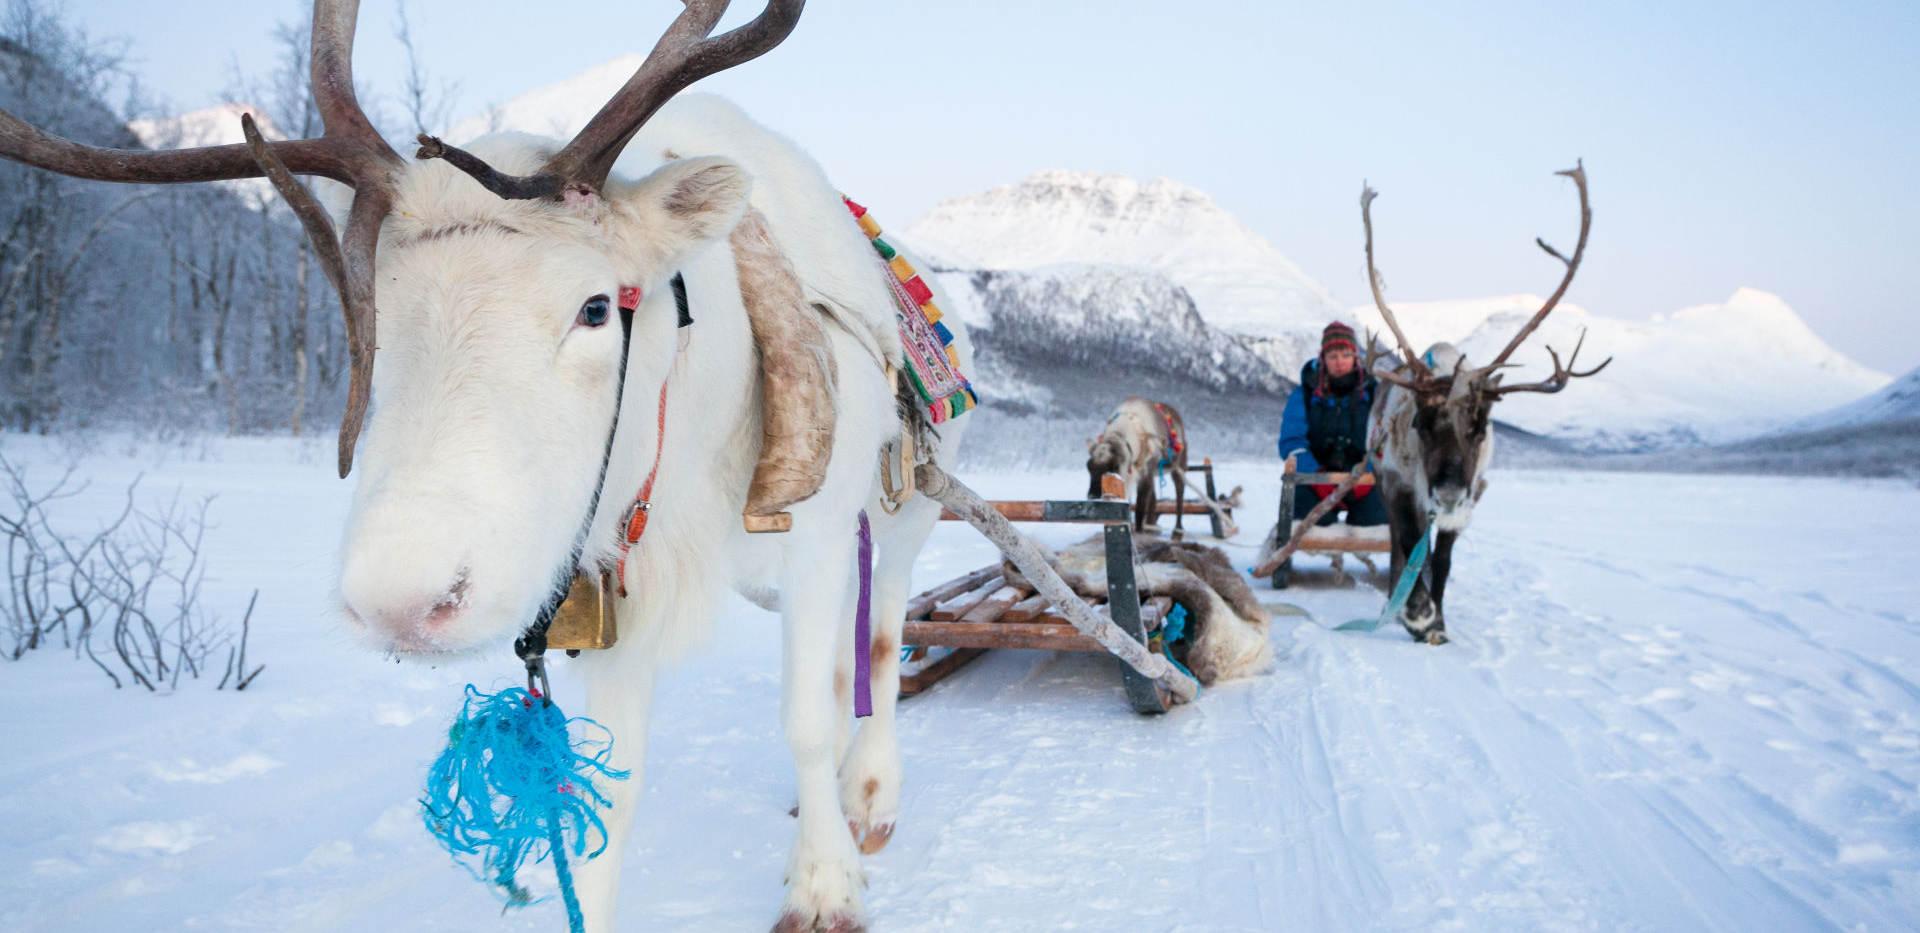 tours-reindeersledding-white-reindeer-ko